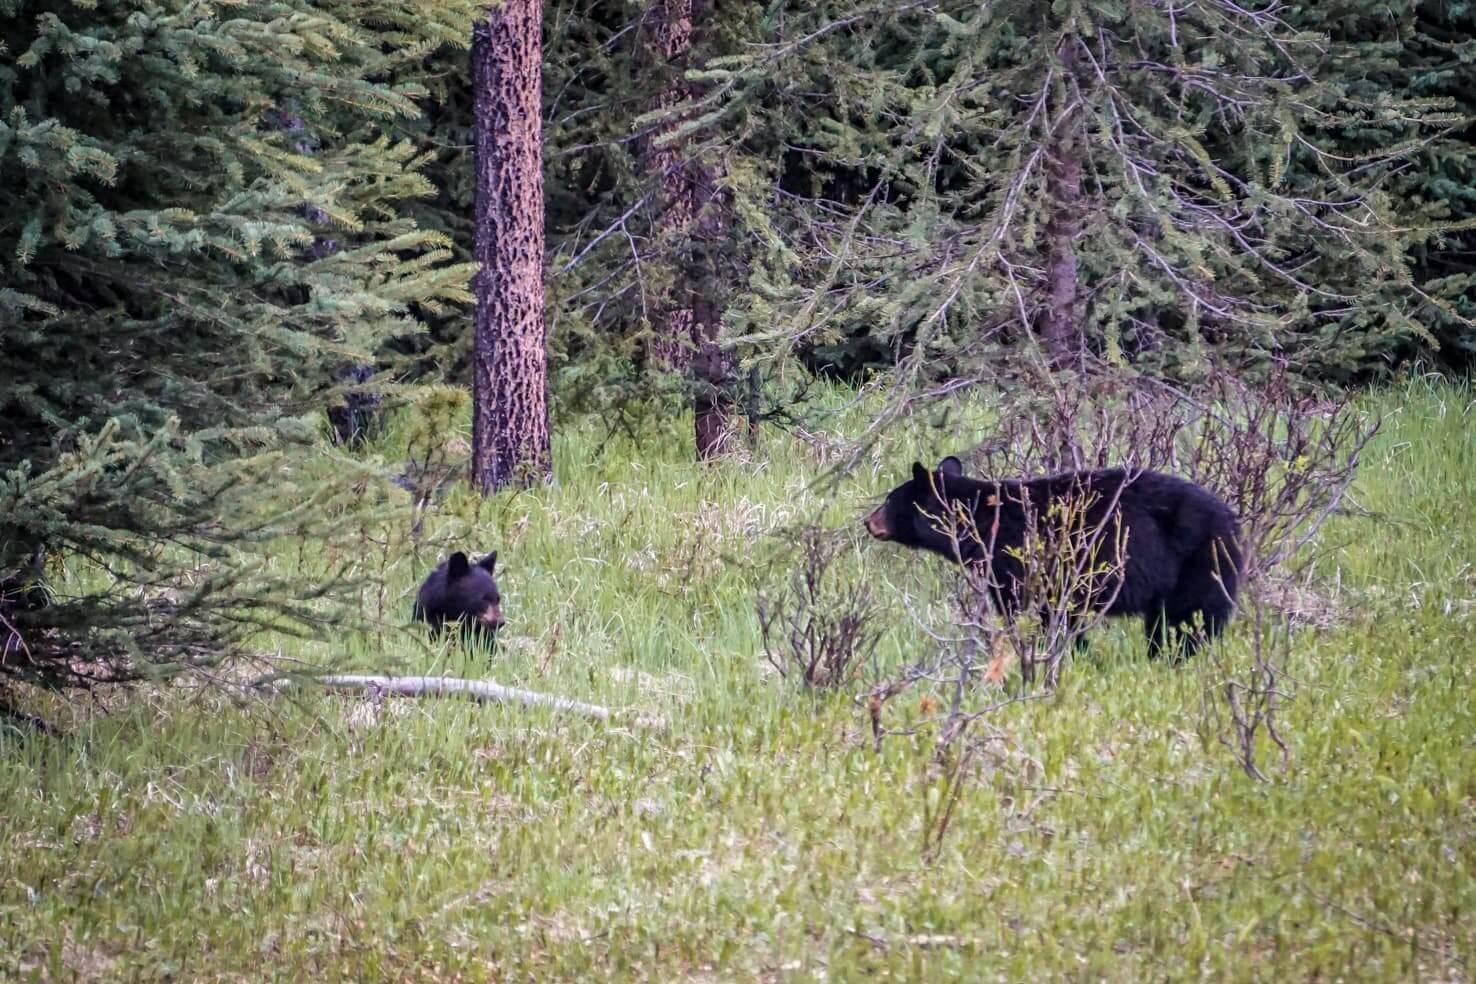 Adventure travel guide to Jasper National Park - mama bear and a cub